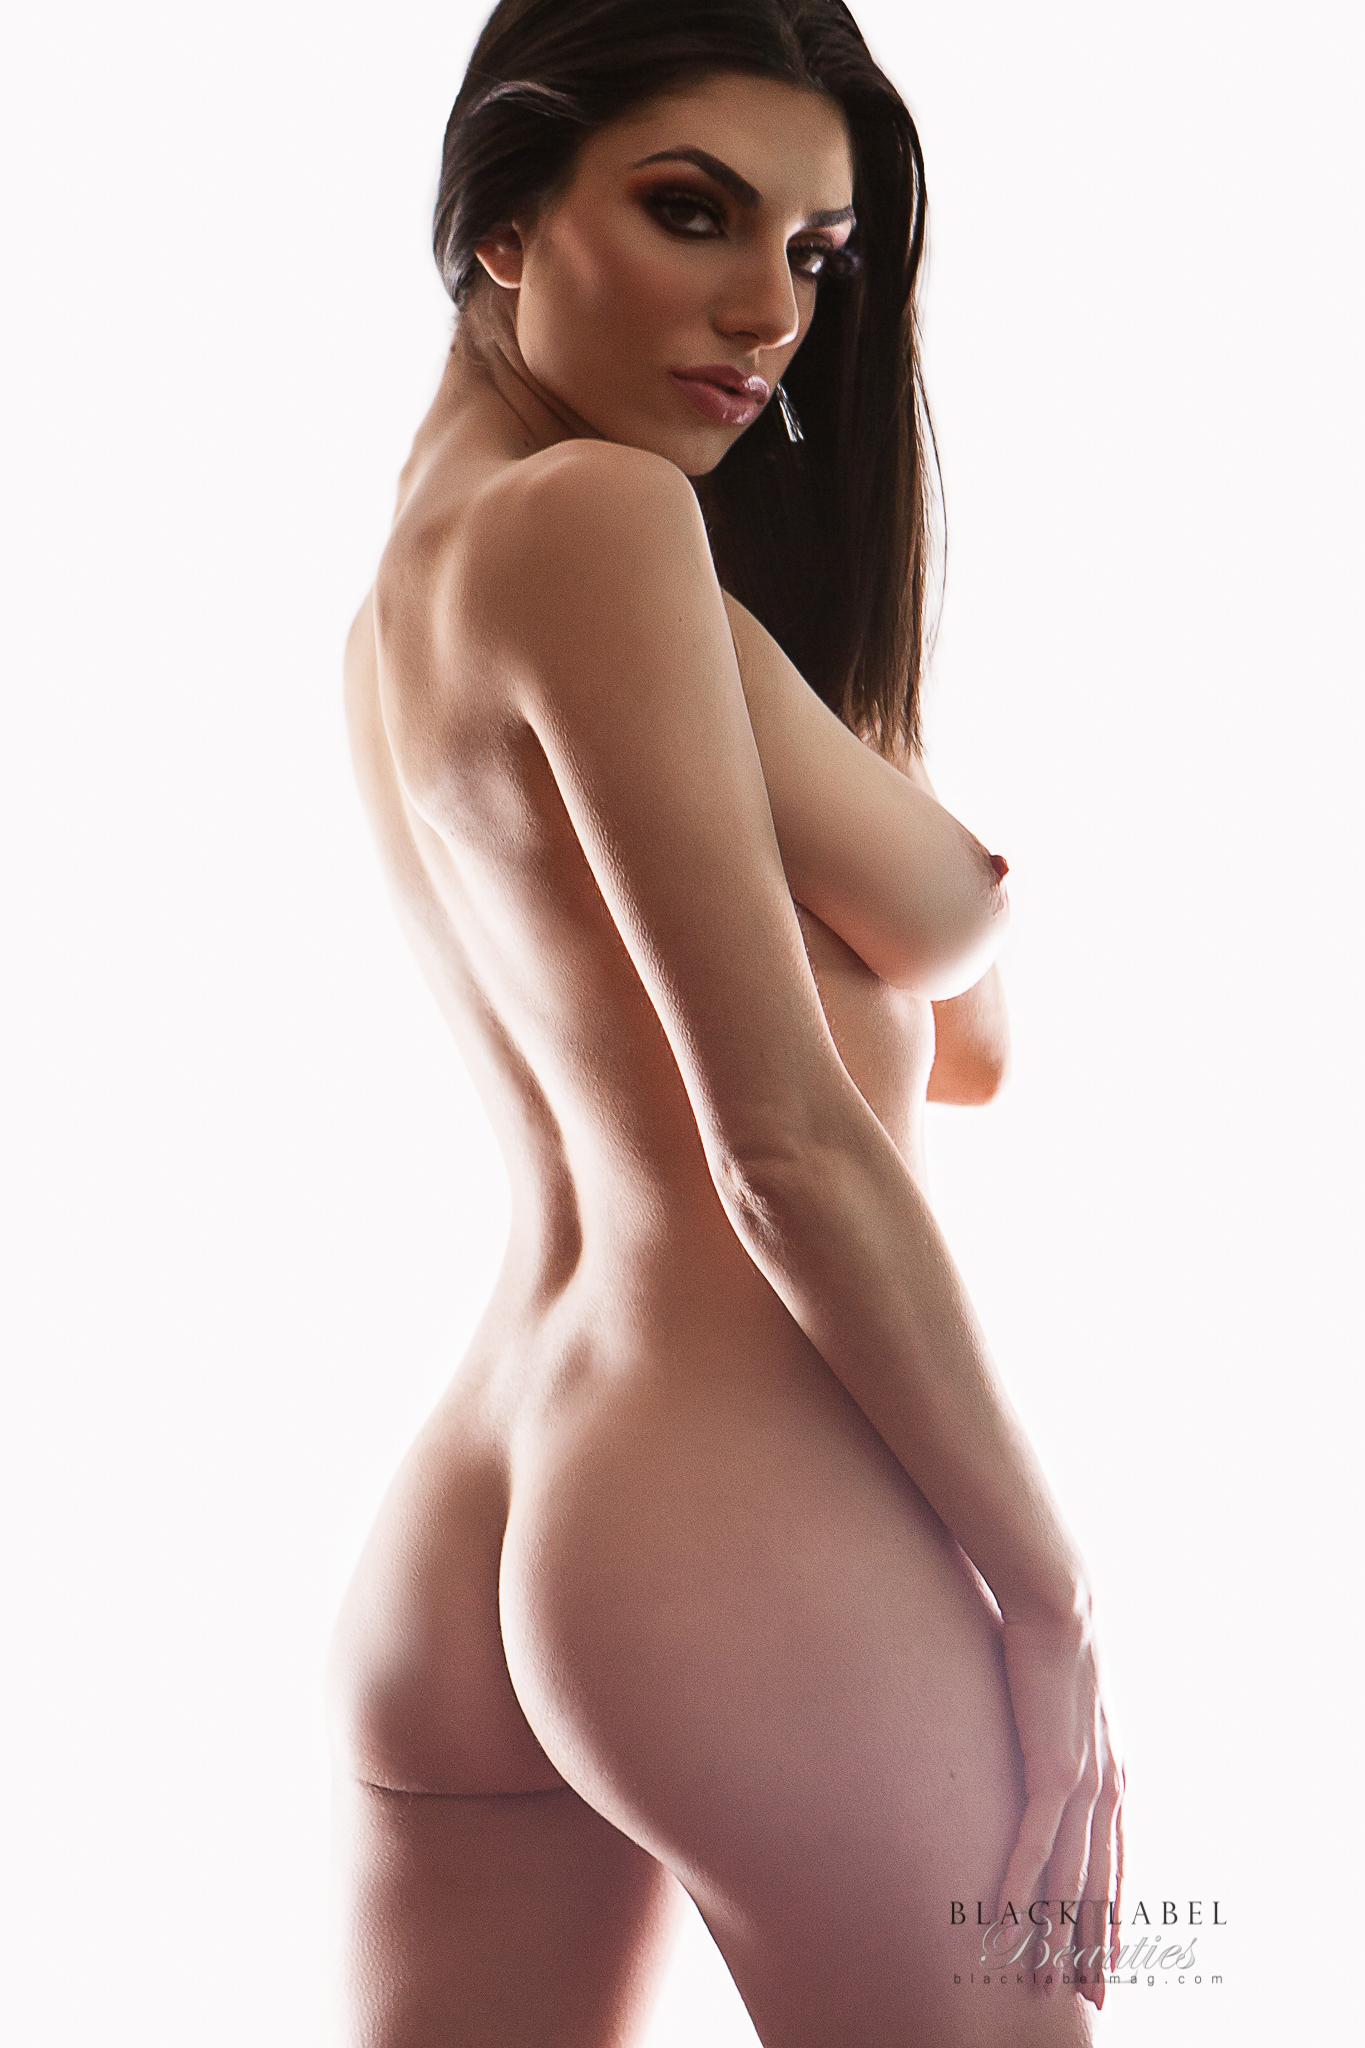 pornstars, big tits, darcie dolce, nude art, sexy women